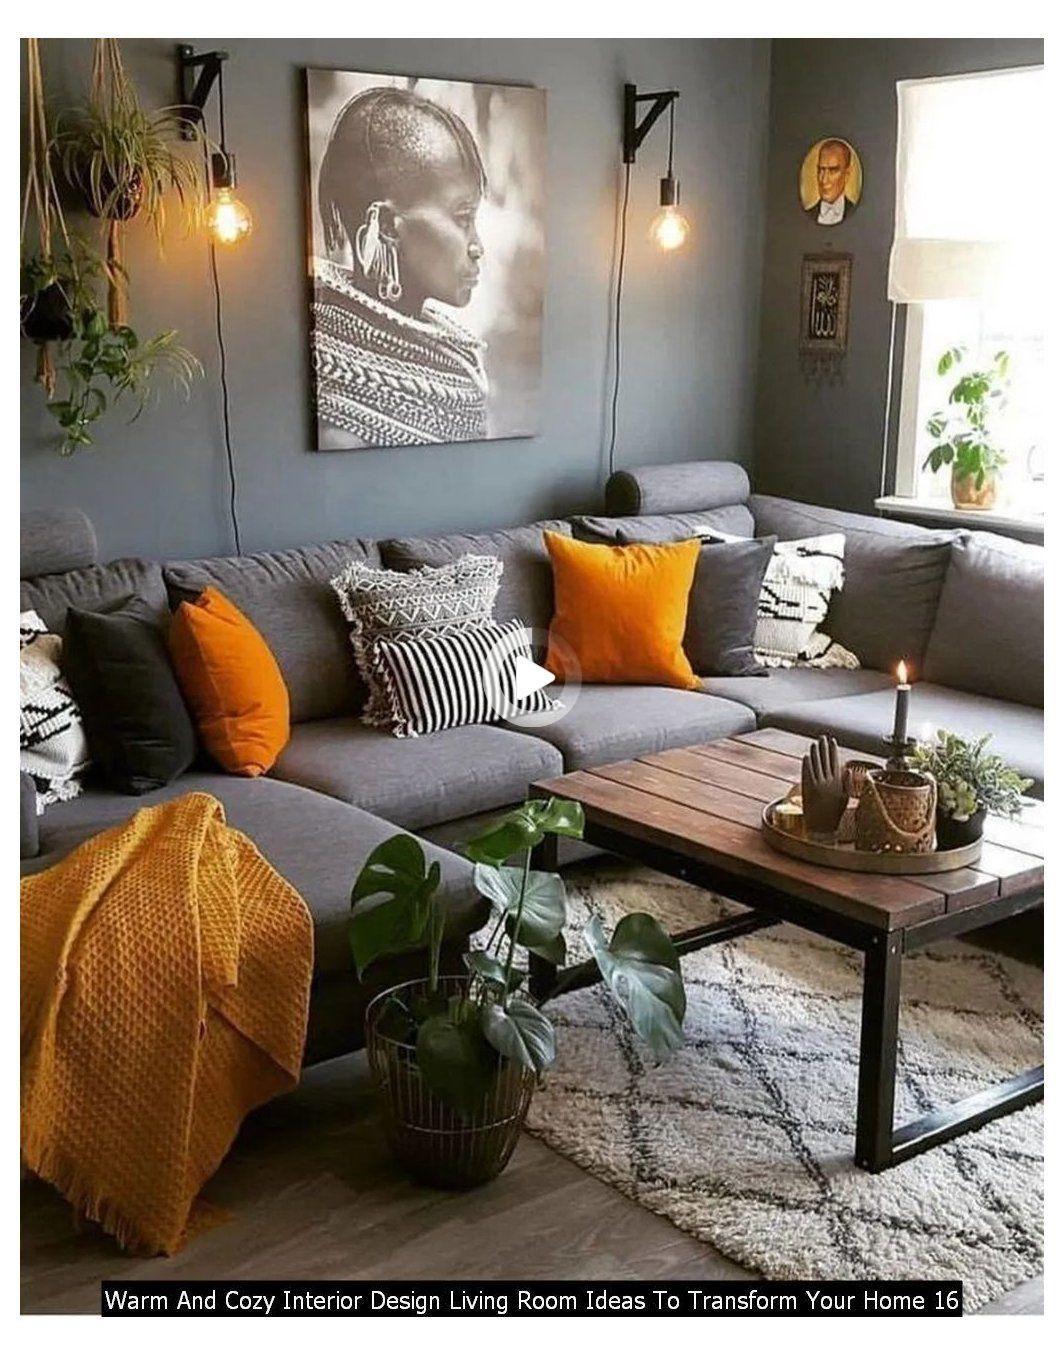 Redirecting Living Room Decor Cozy Cozy Living Room Warm Living Room Warm Warm living room decor